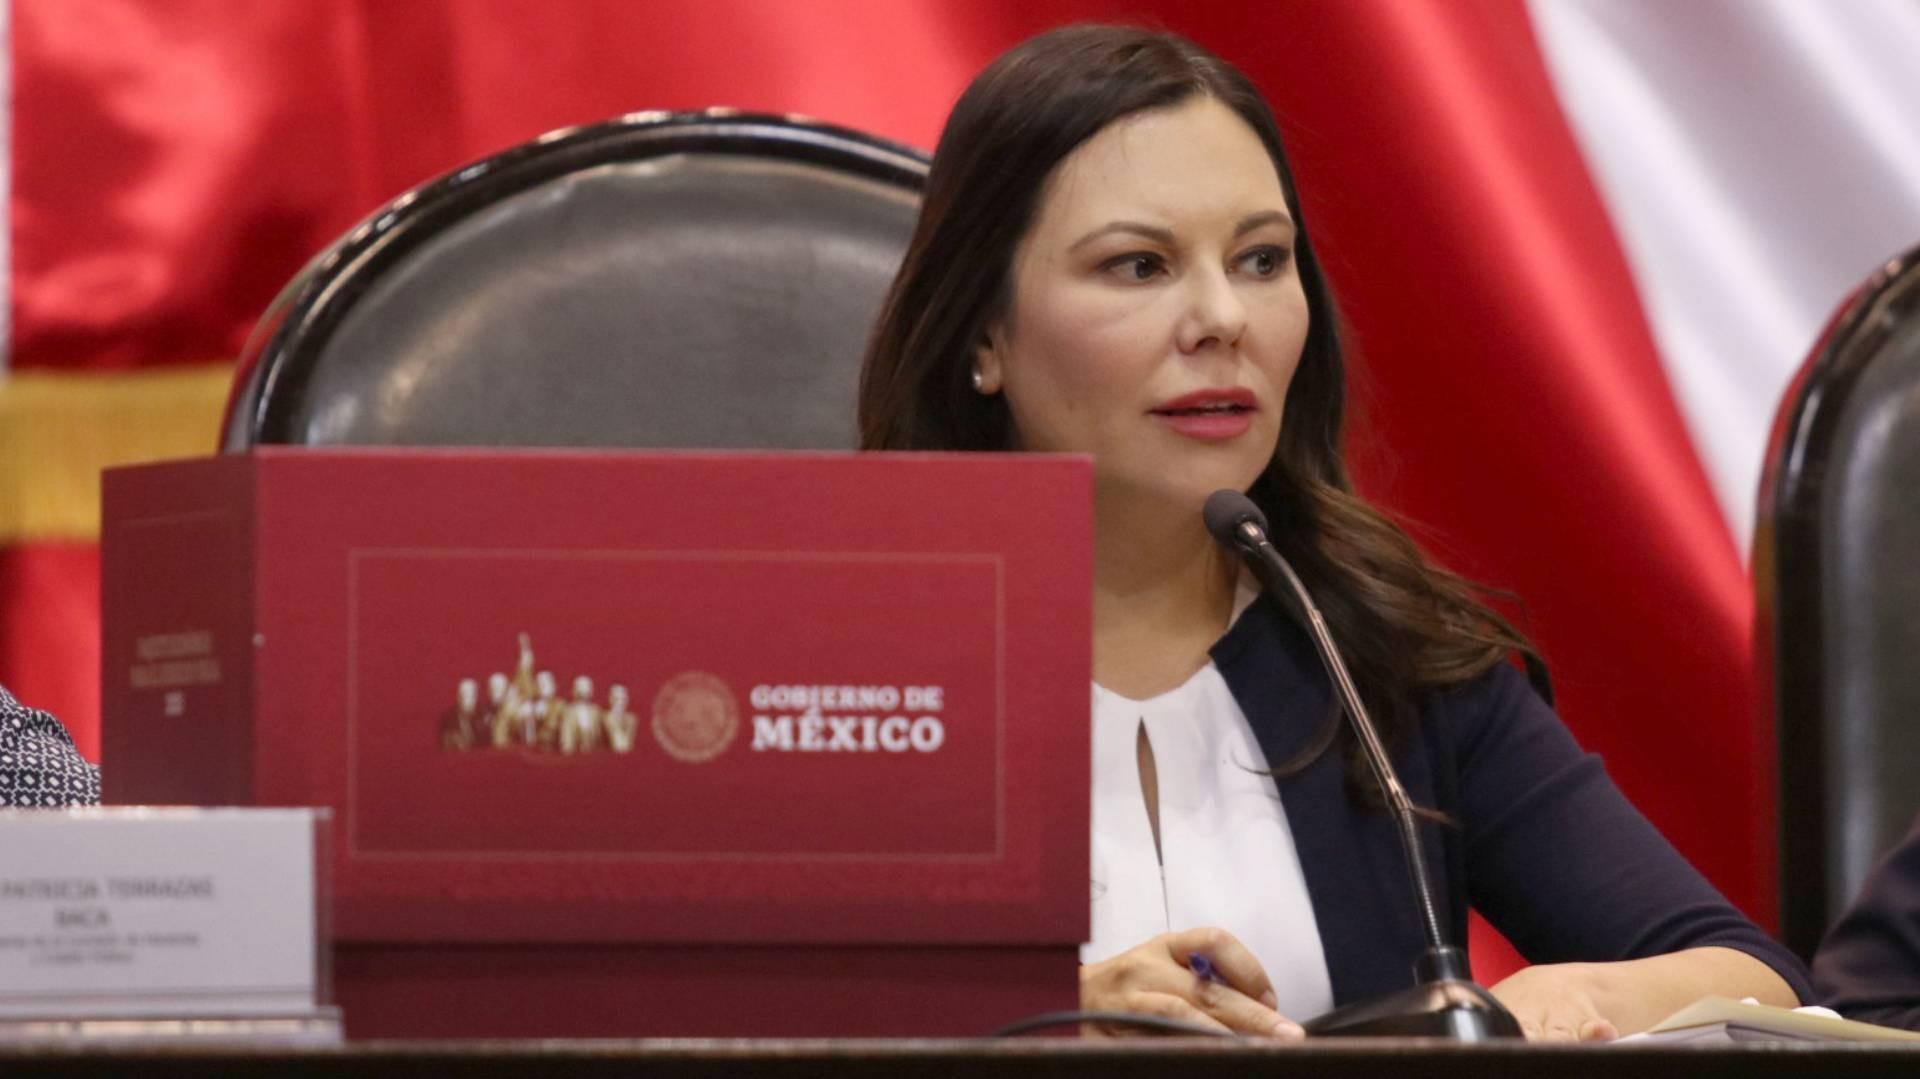 Actor Porno En Parlamento parlamentarios de américa latina intercambiarán propuestas